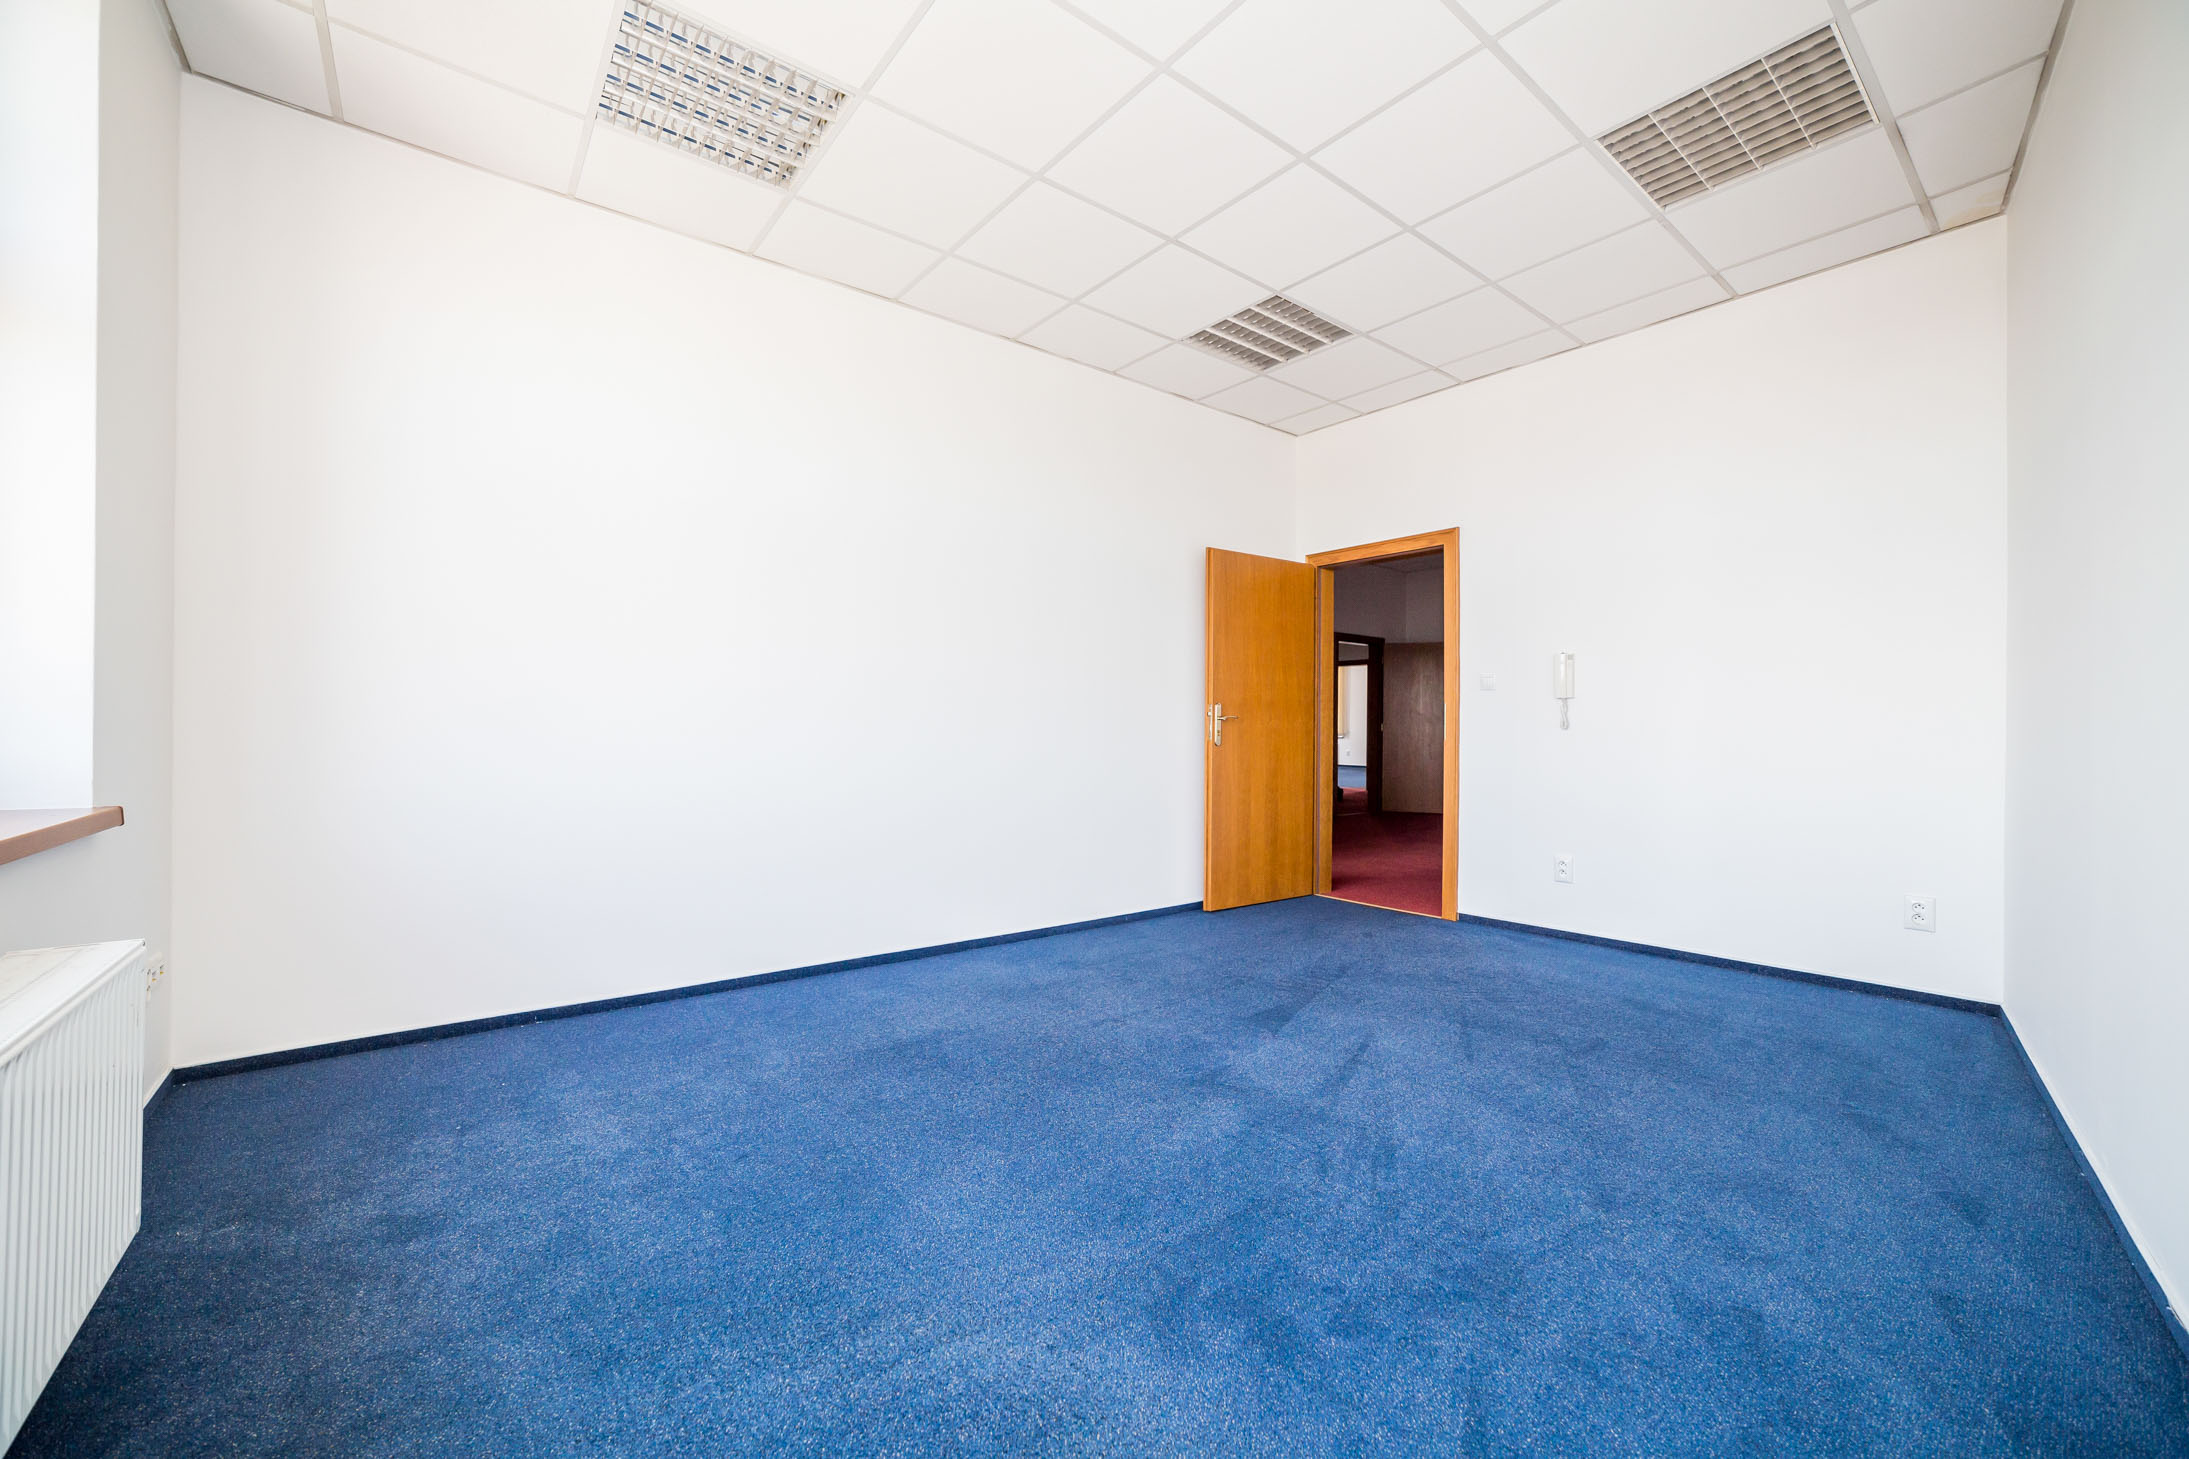 opava reality podhled svetlo dvere modry koberec telefon parapet radiator